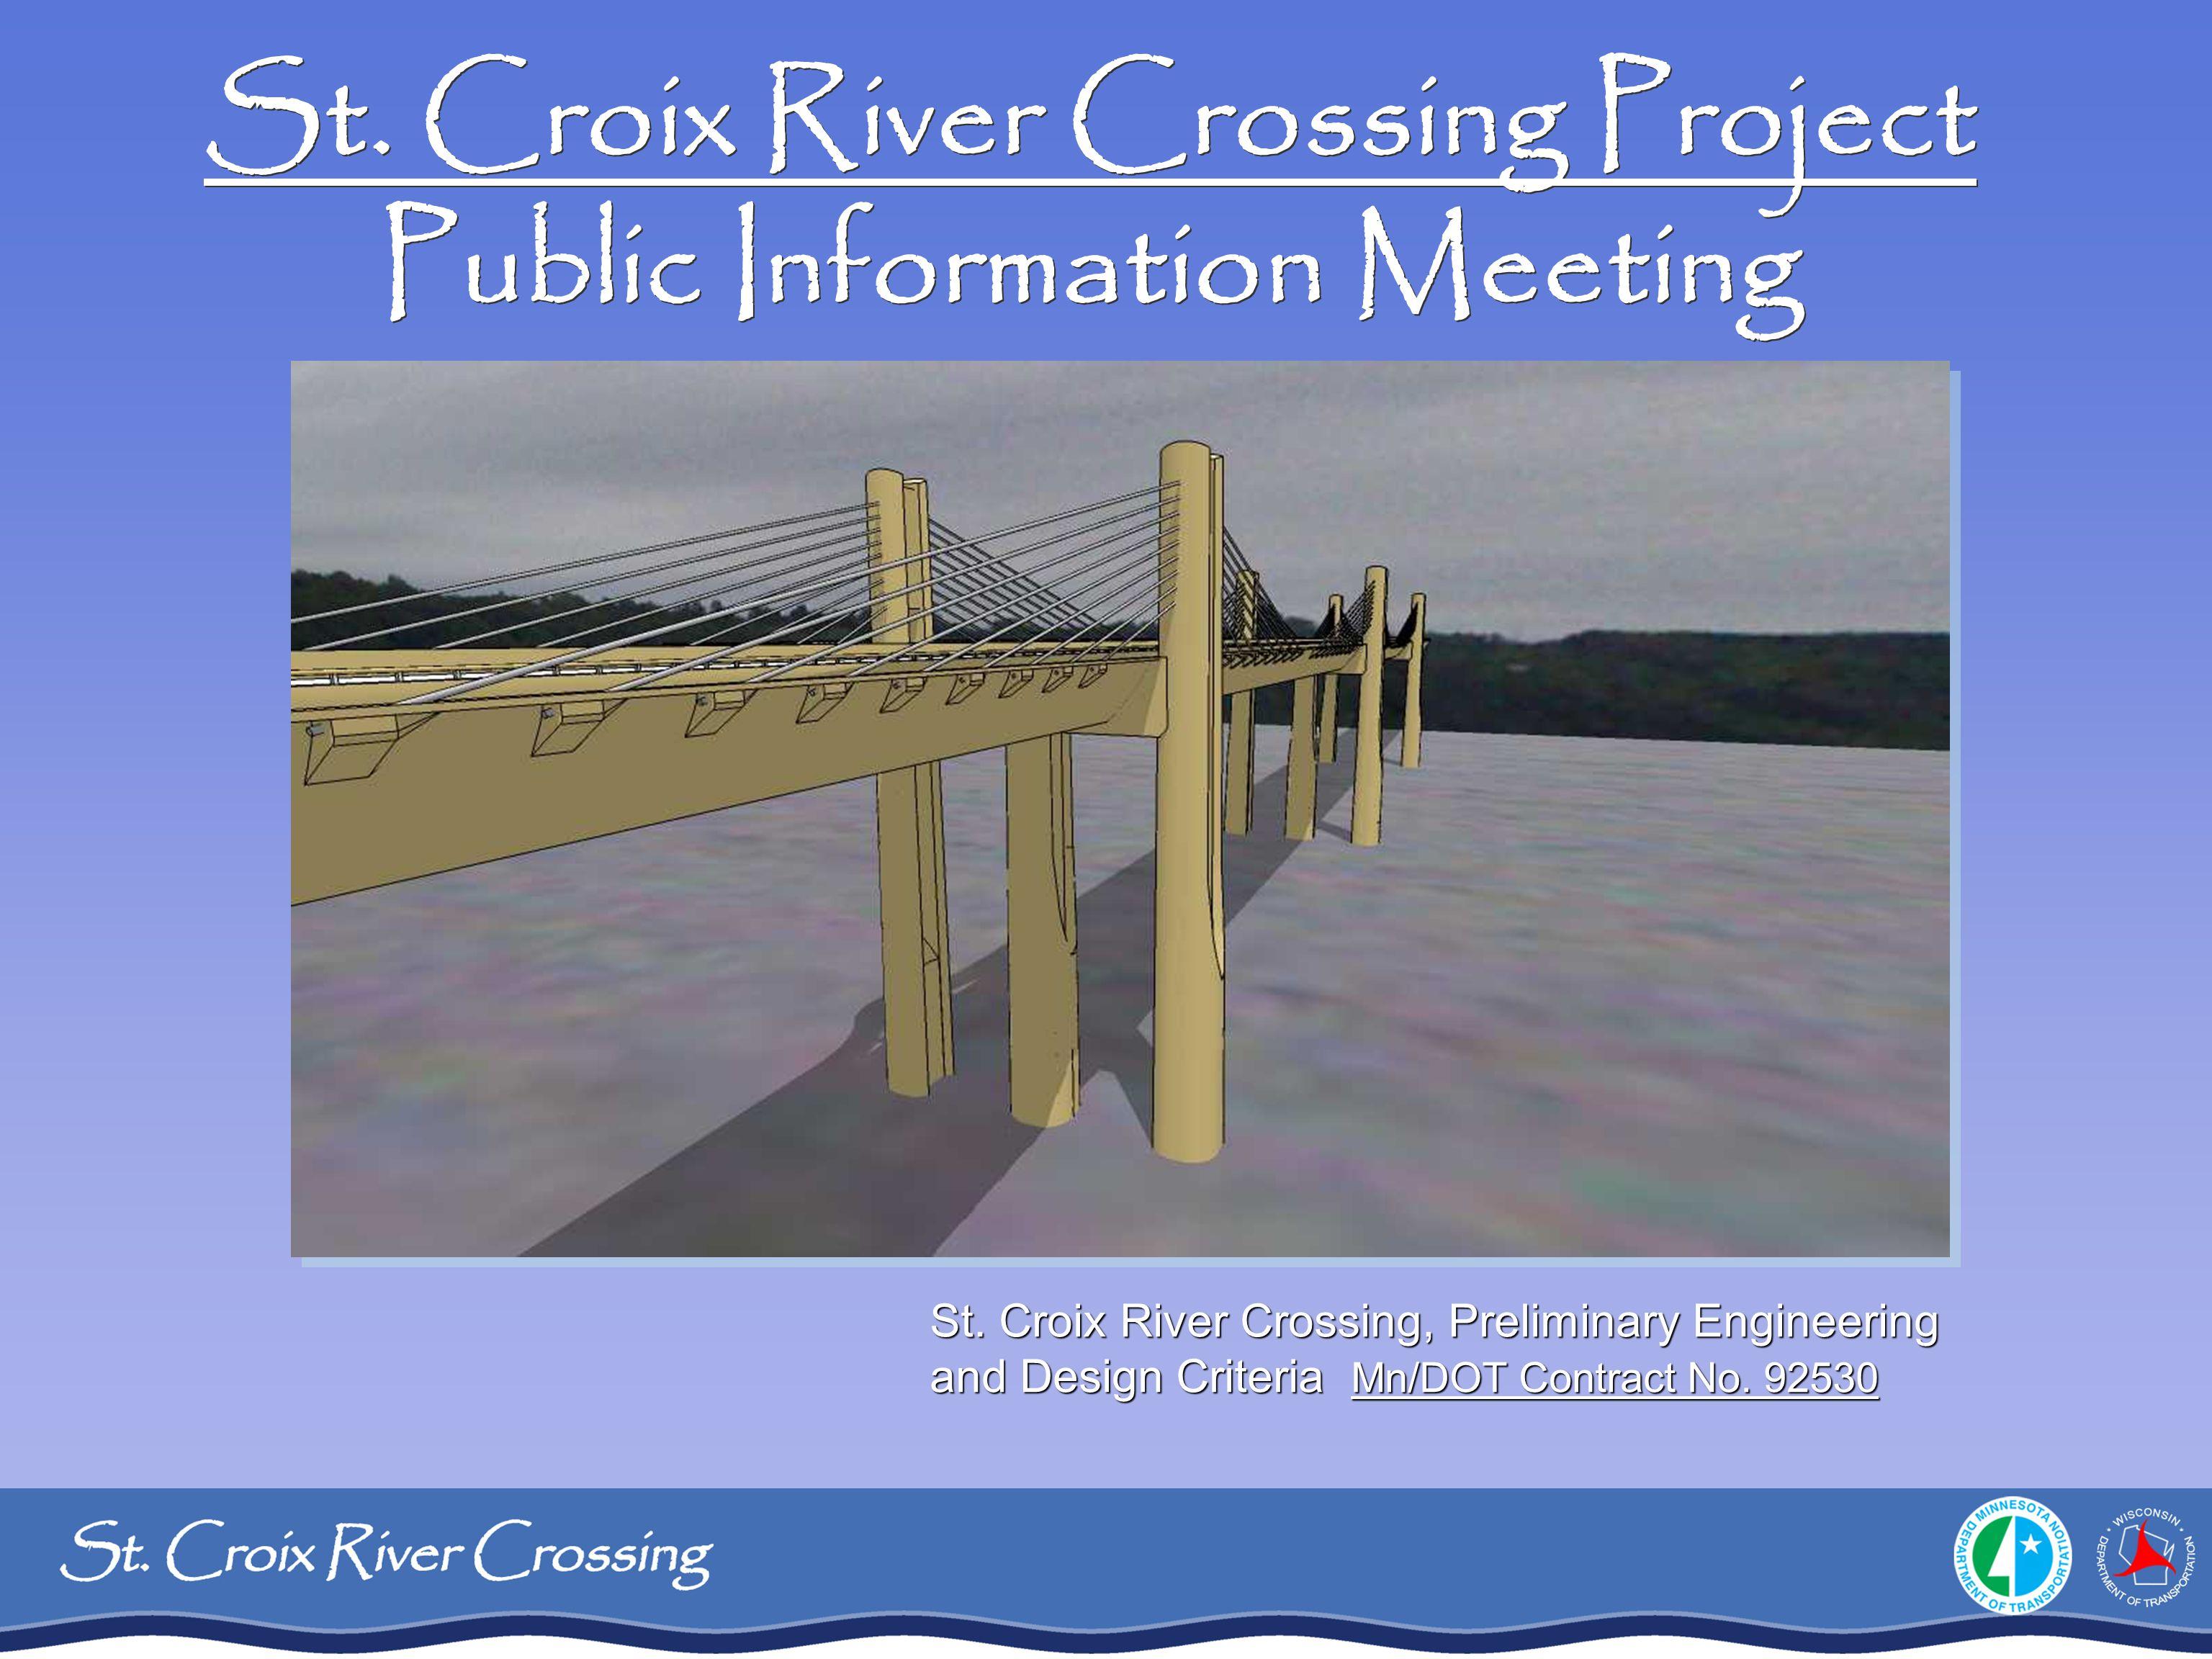 St. Croix River Crossing Project Public Information Meeting St. Croix River Crossing, Preliminary Engineering and Design Criteria Mn/DOT Contract No.